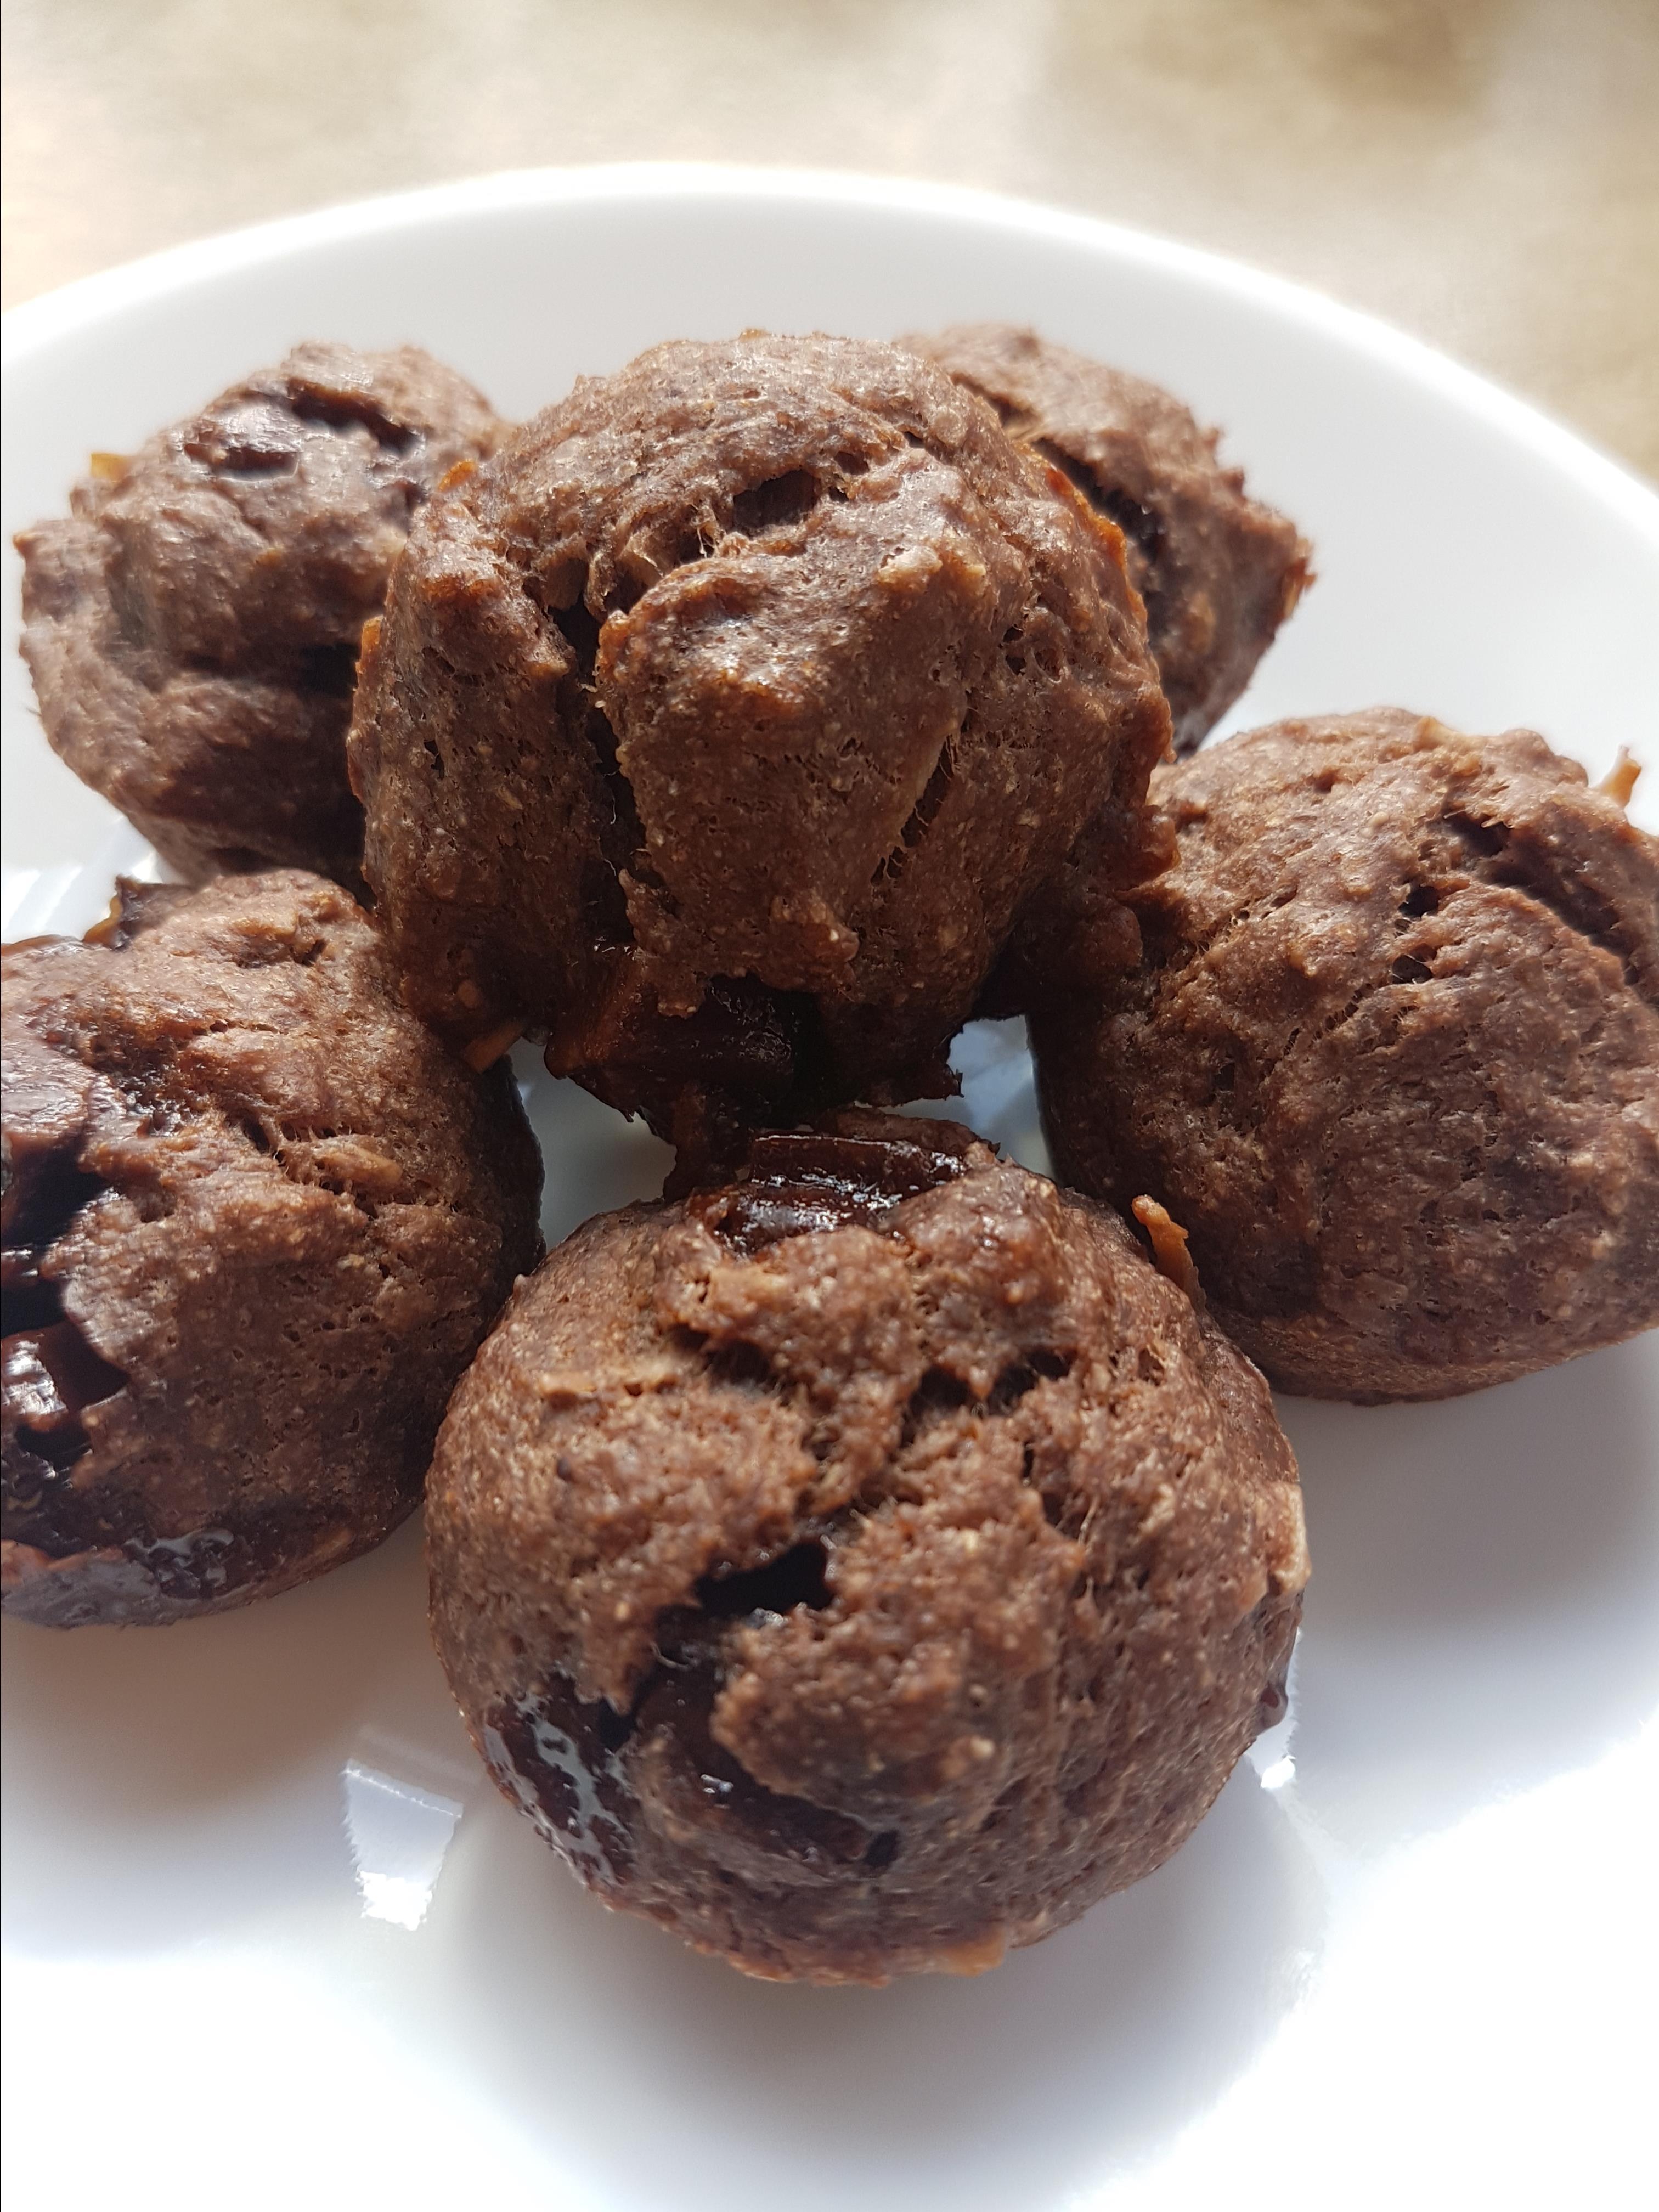 Healthy Chocolate-Coconut Banana Muffins